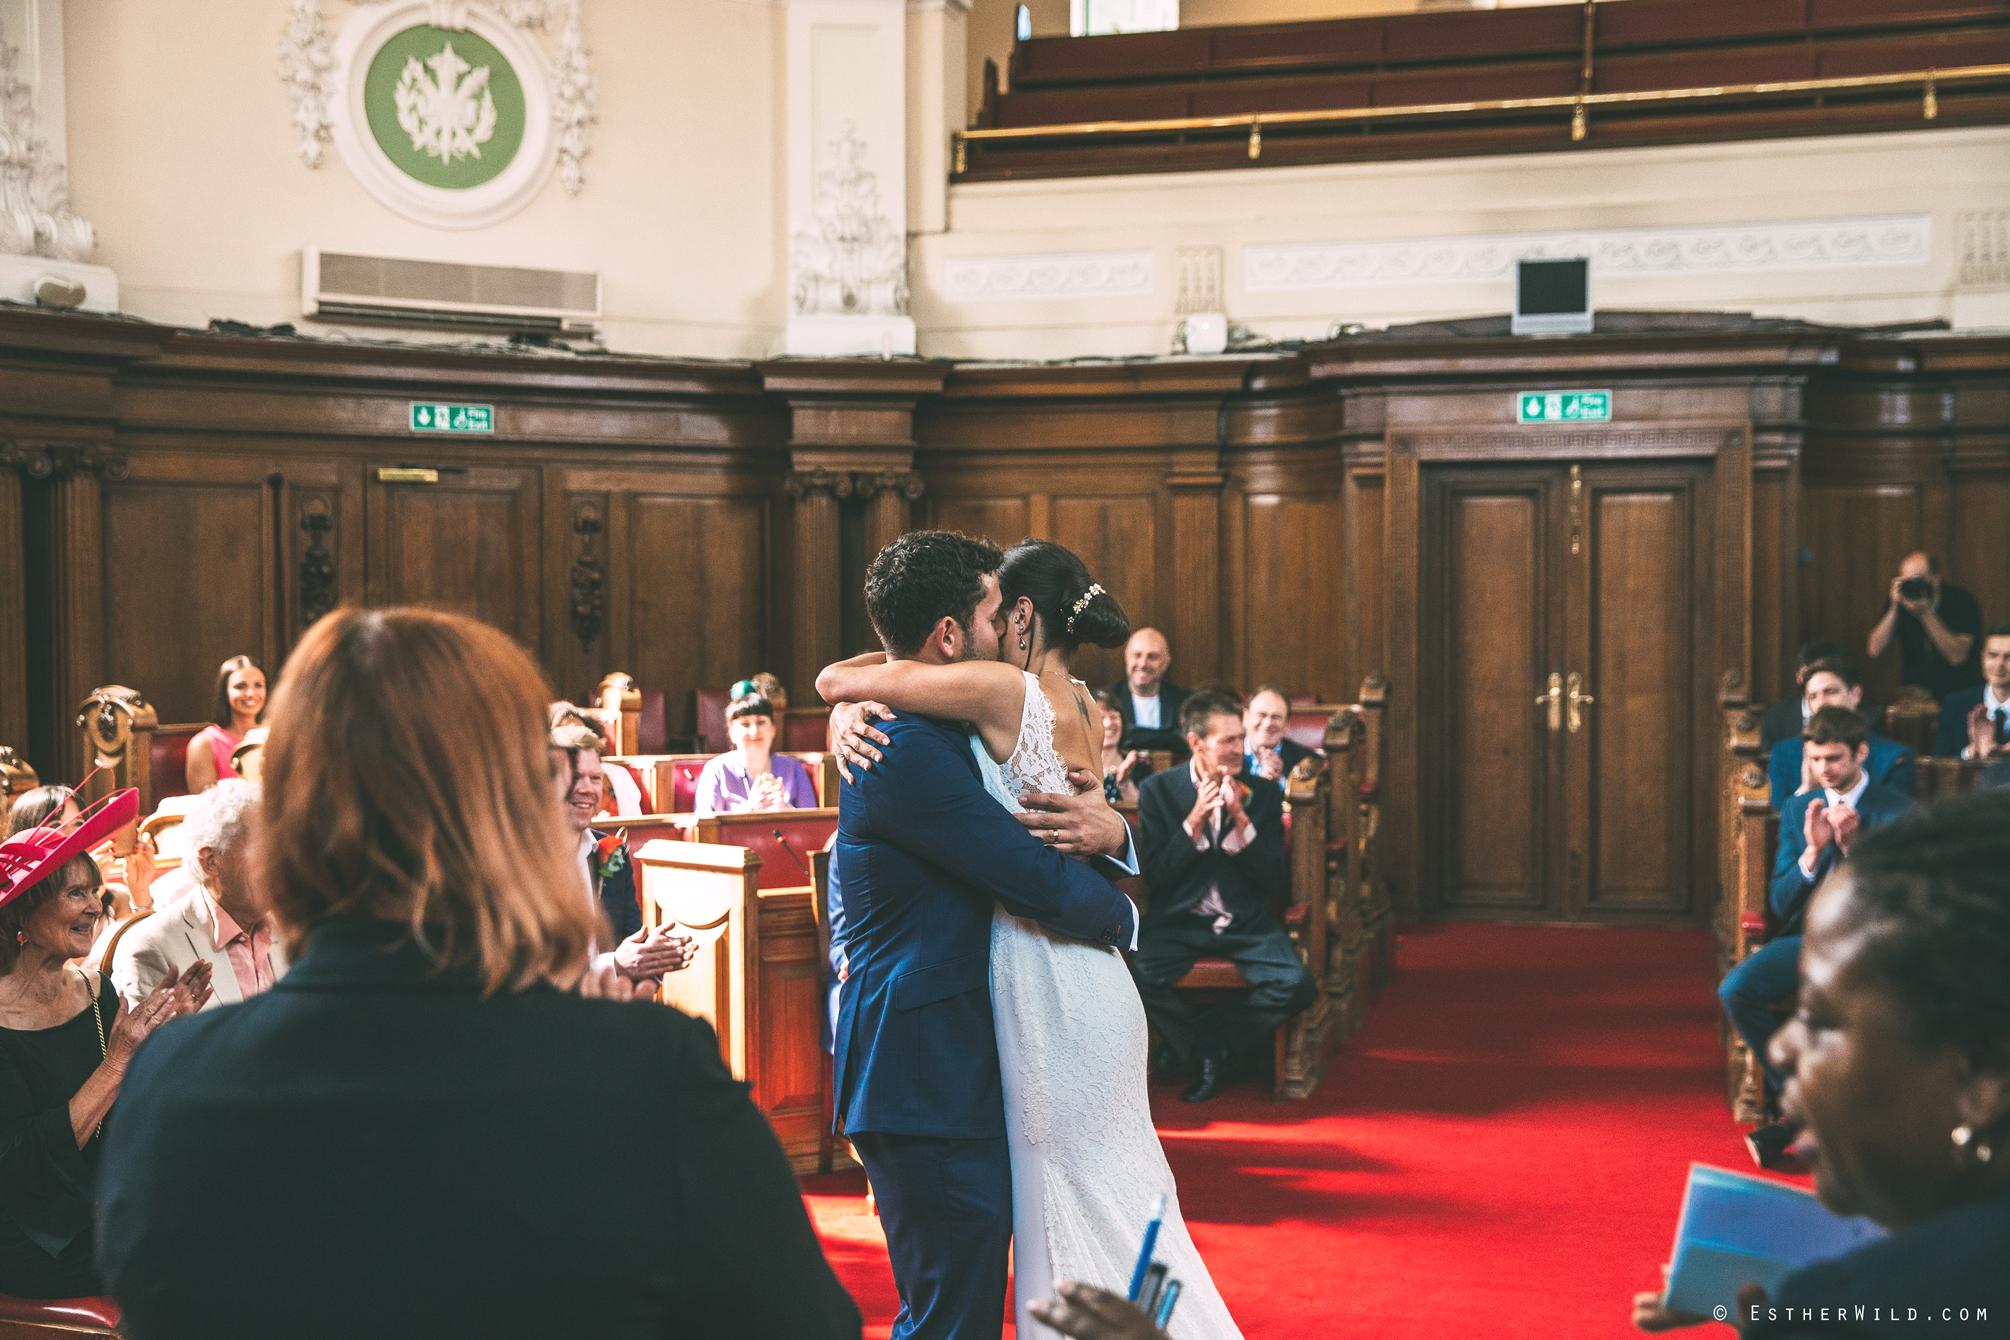 Islington_Town_Hall_Wedding_London_Photographer_Esther_Wild_IMG_4912.jpg